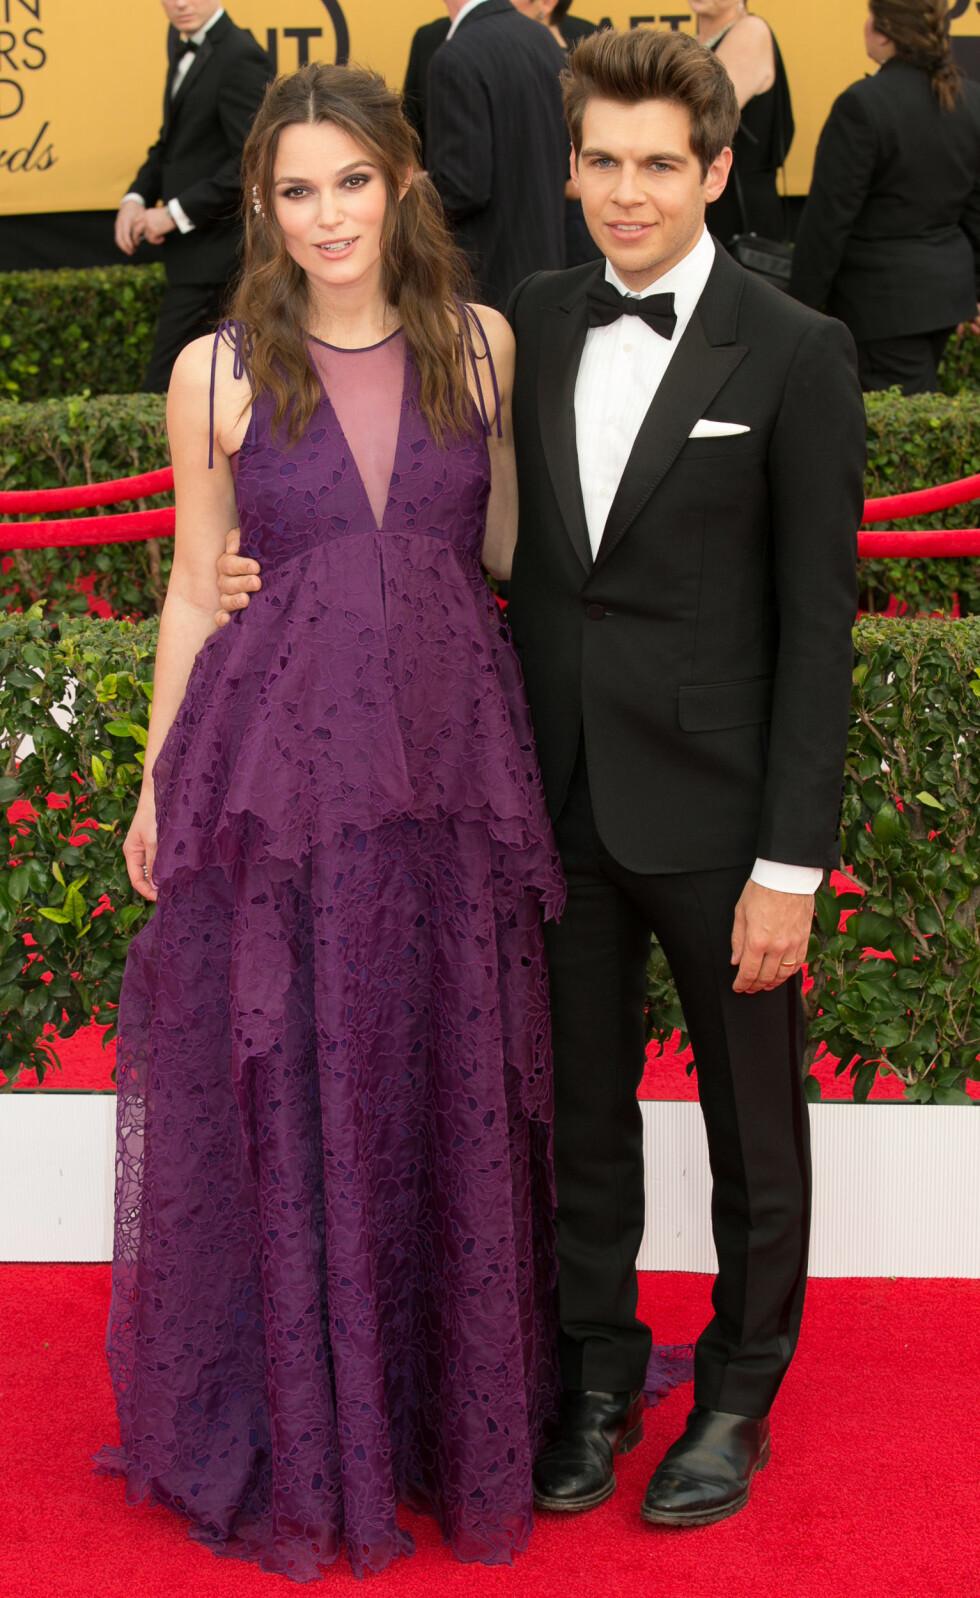 FLOTT PAR: Under fjorårets SAG Awards i Los Angeles kom filmstjernen sammen med ektemannen James. Foto: wenn.com